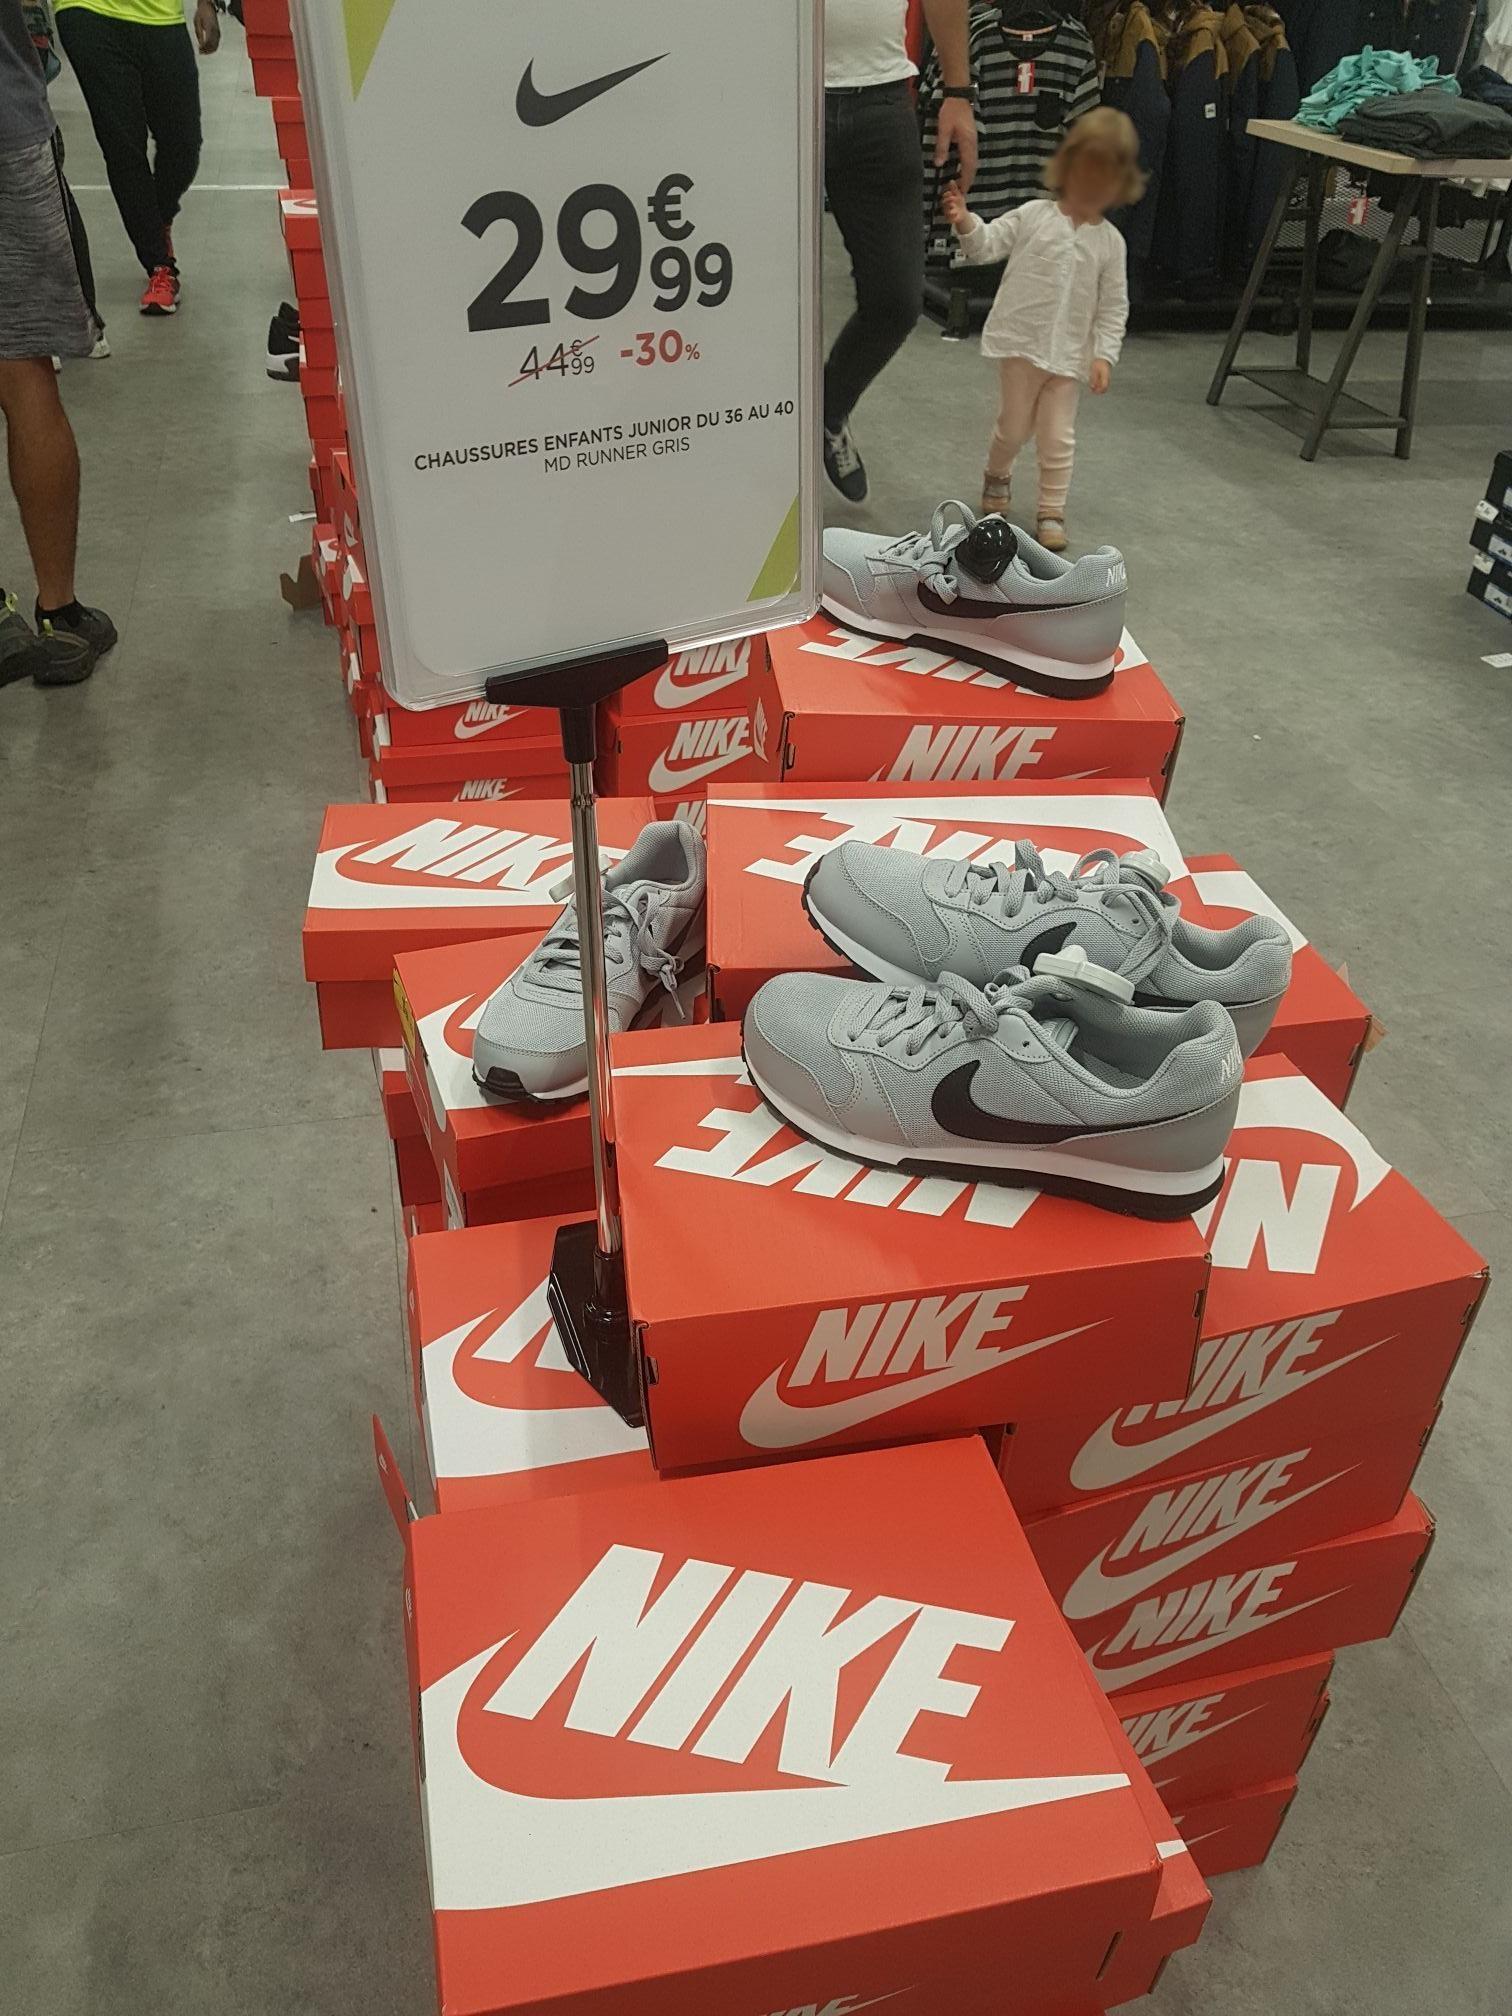 Baskets Nike MD Runner 2 BG - Gris pour Enfant (Rosny-sous-Bois 93)